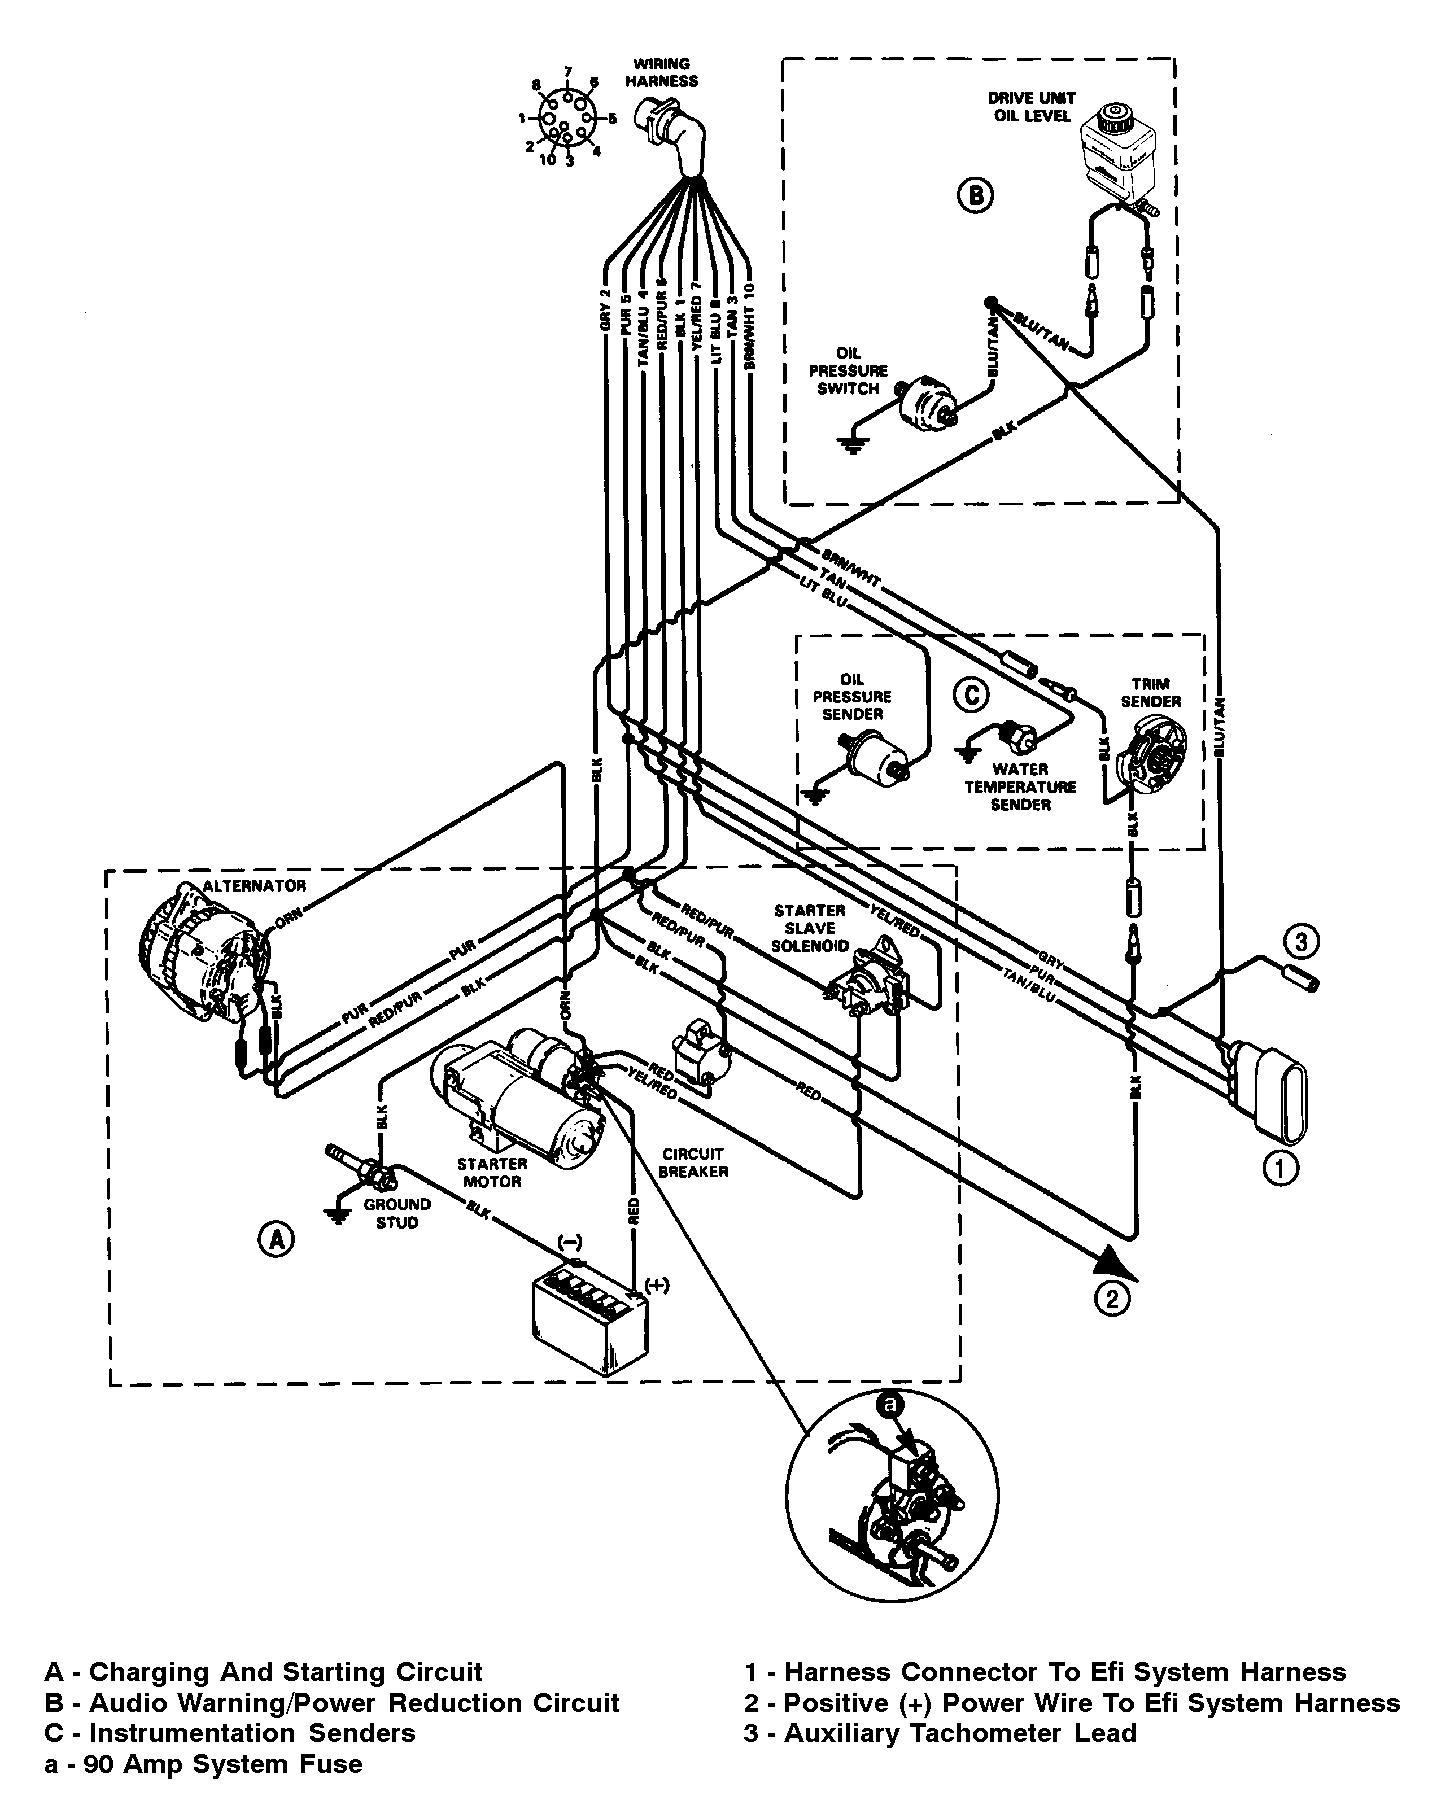 Wilson Alternator Wiring Diagram on Wilson Alternator Wiring Diagram